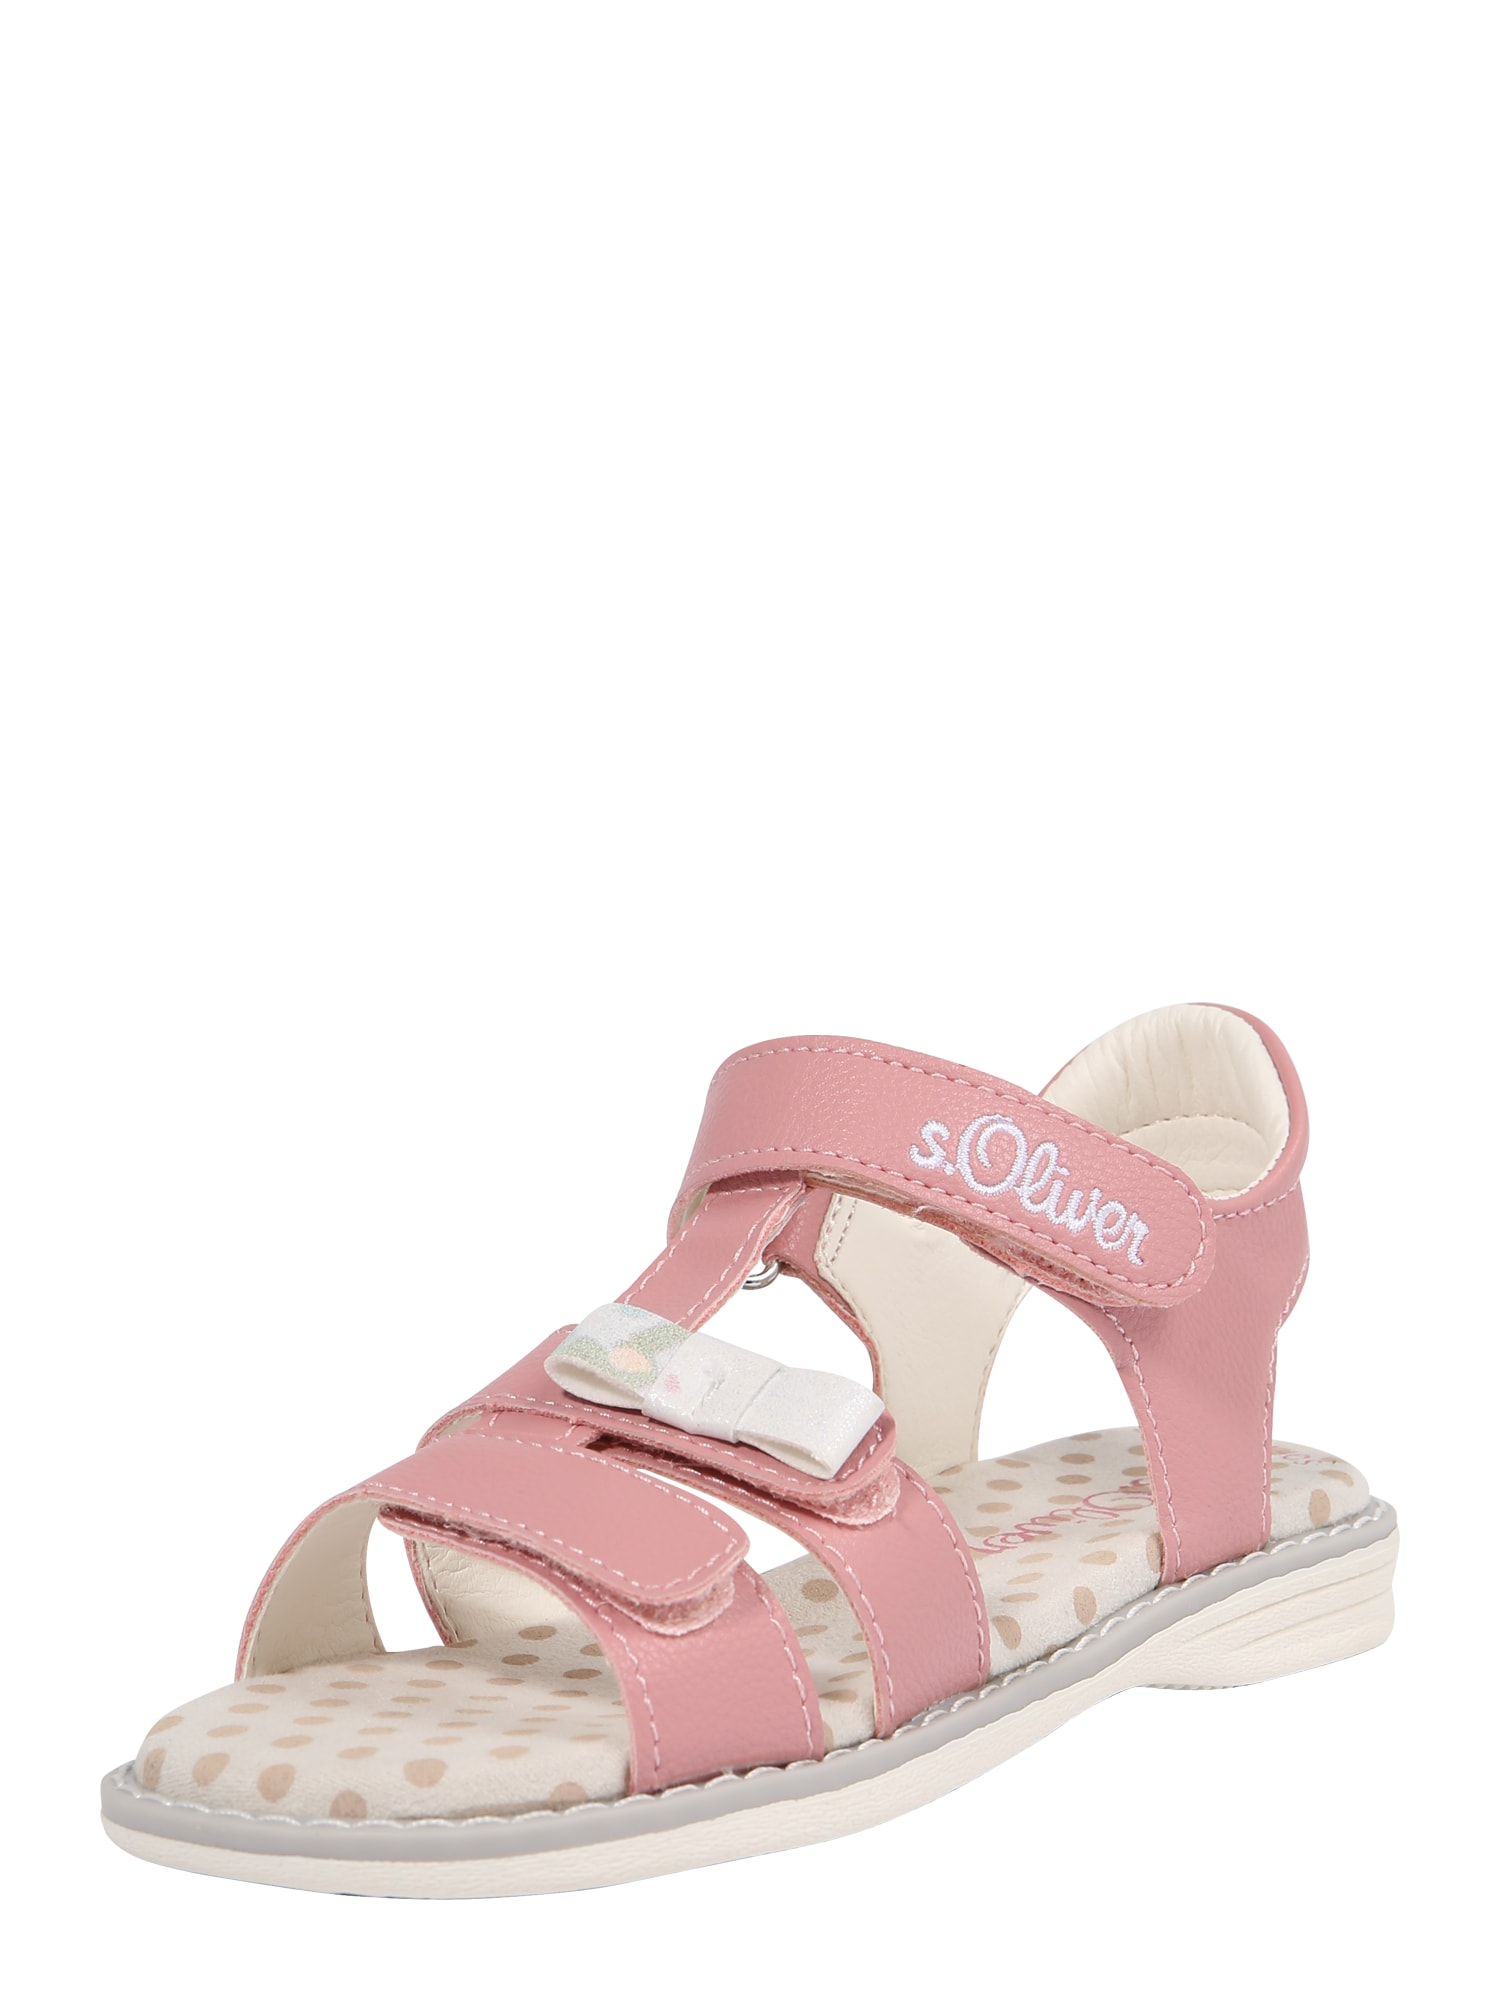 Sandály růžová S.Oliver Junior